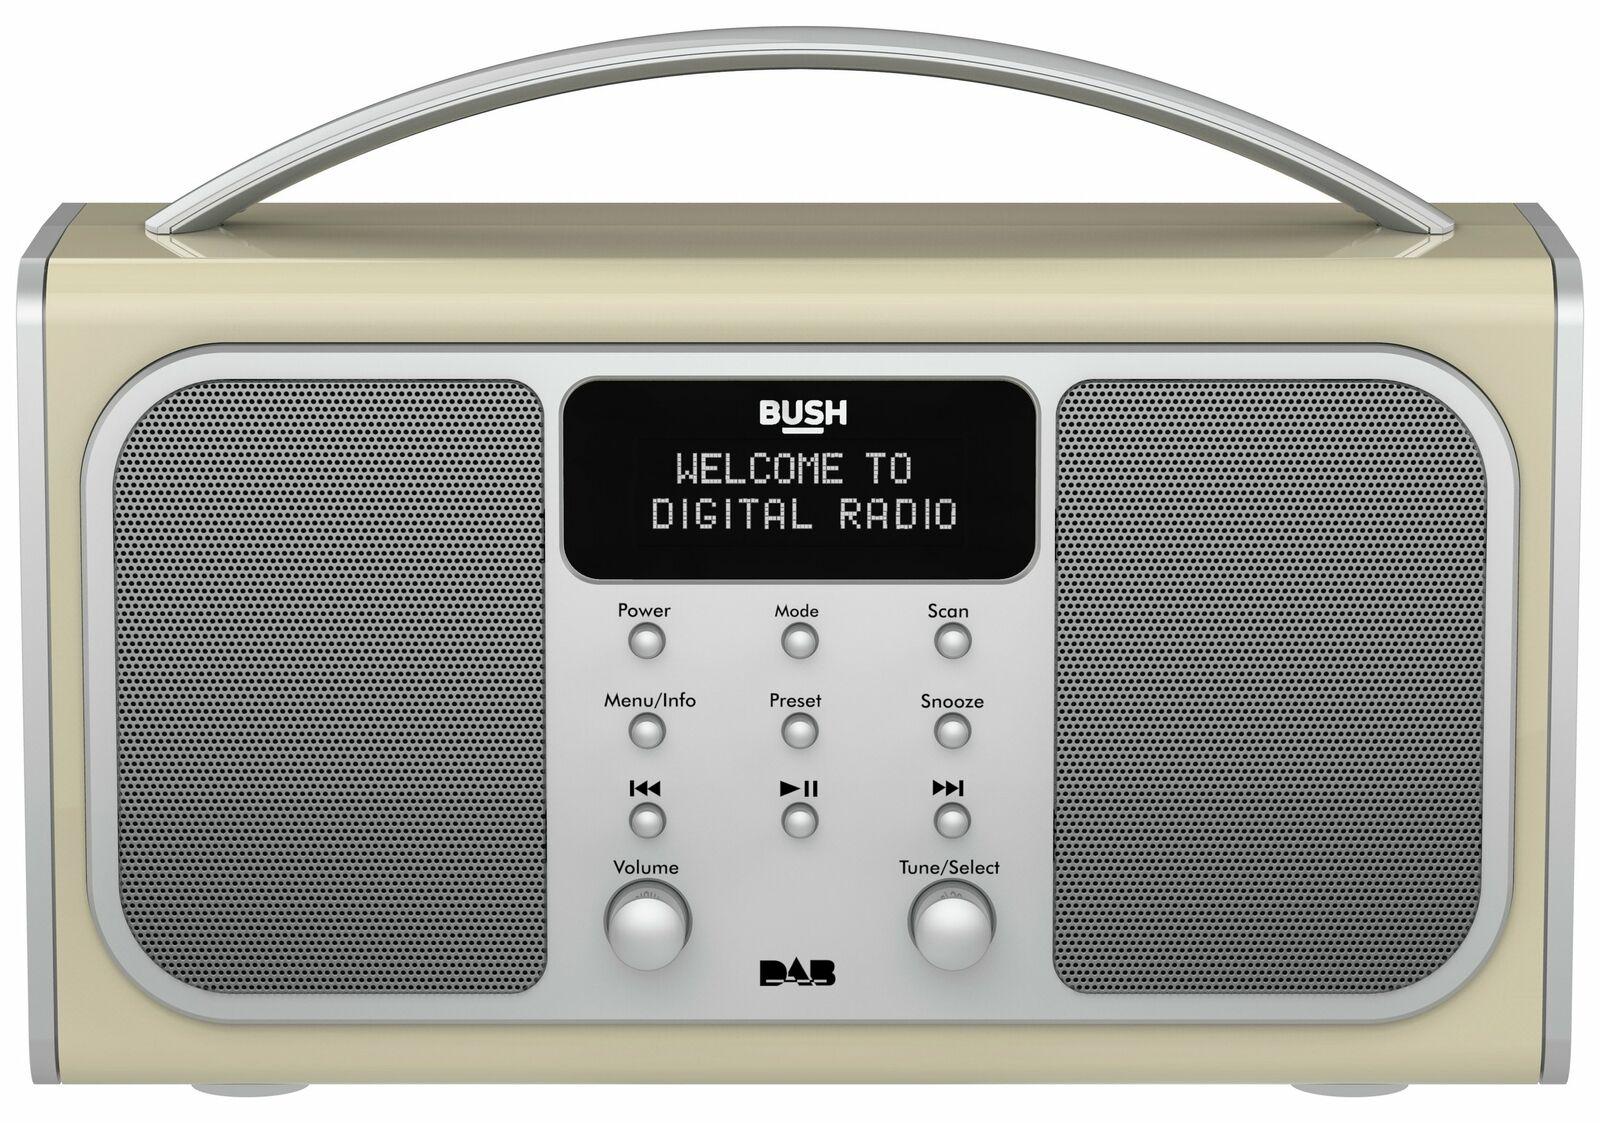 Bush Bluetooth LCD RDS DAB Radio Wireless Speaker Headphone socket - Cream £26.94 Argos on eBay